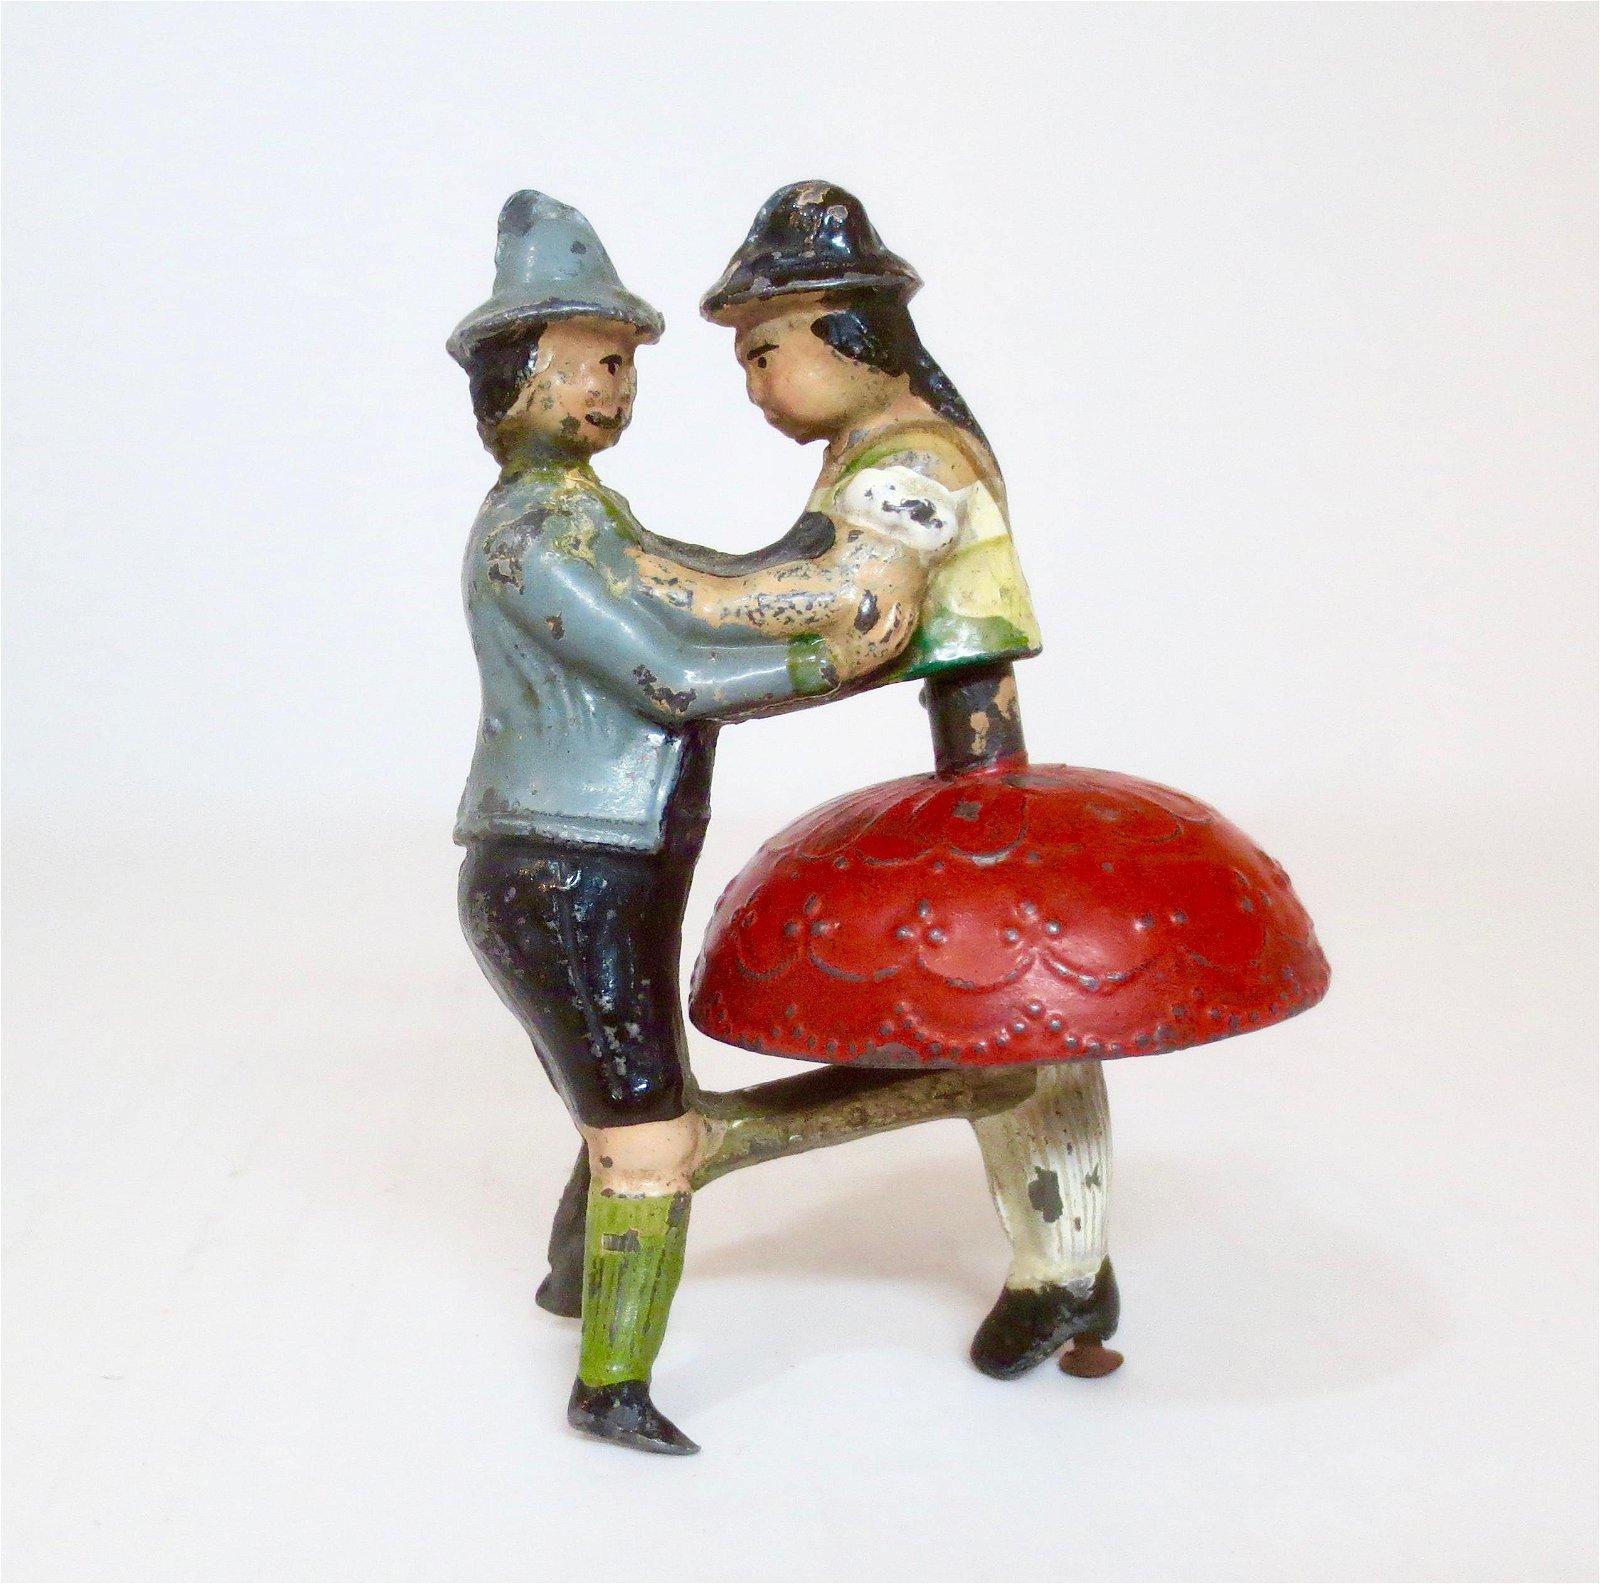 Heyde EXCEEDINGLY RARE Tyrolean Dancing Couple